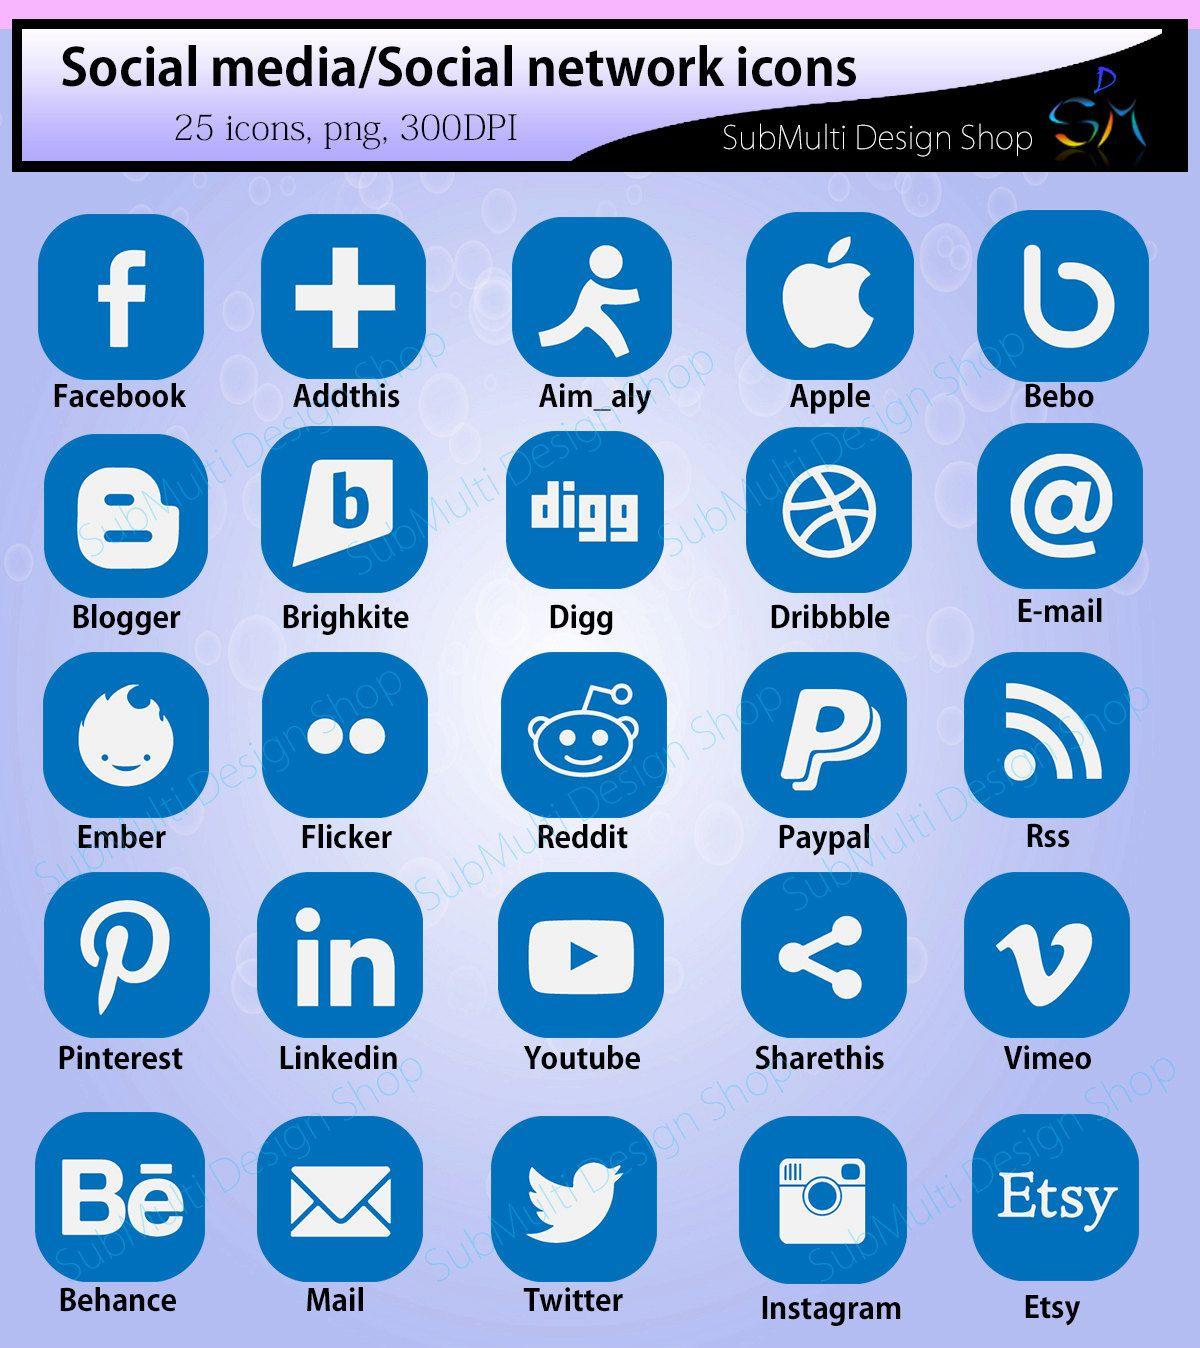 Social media icons / social network icons / icons / web